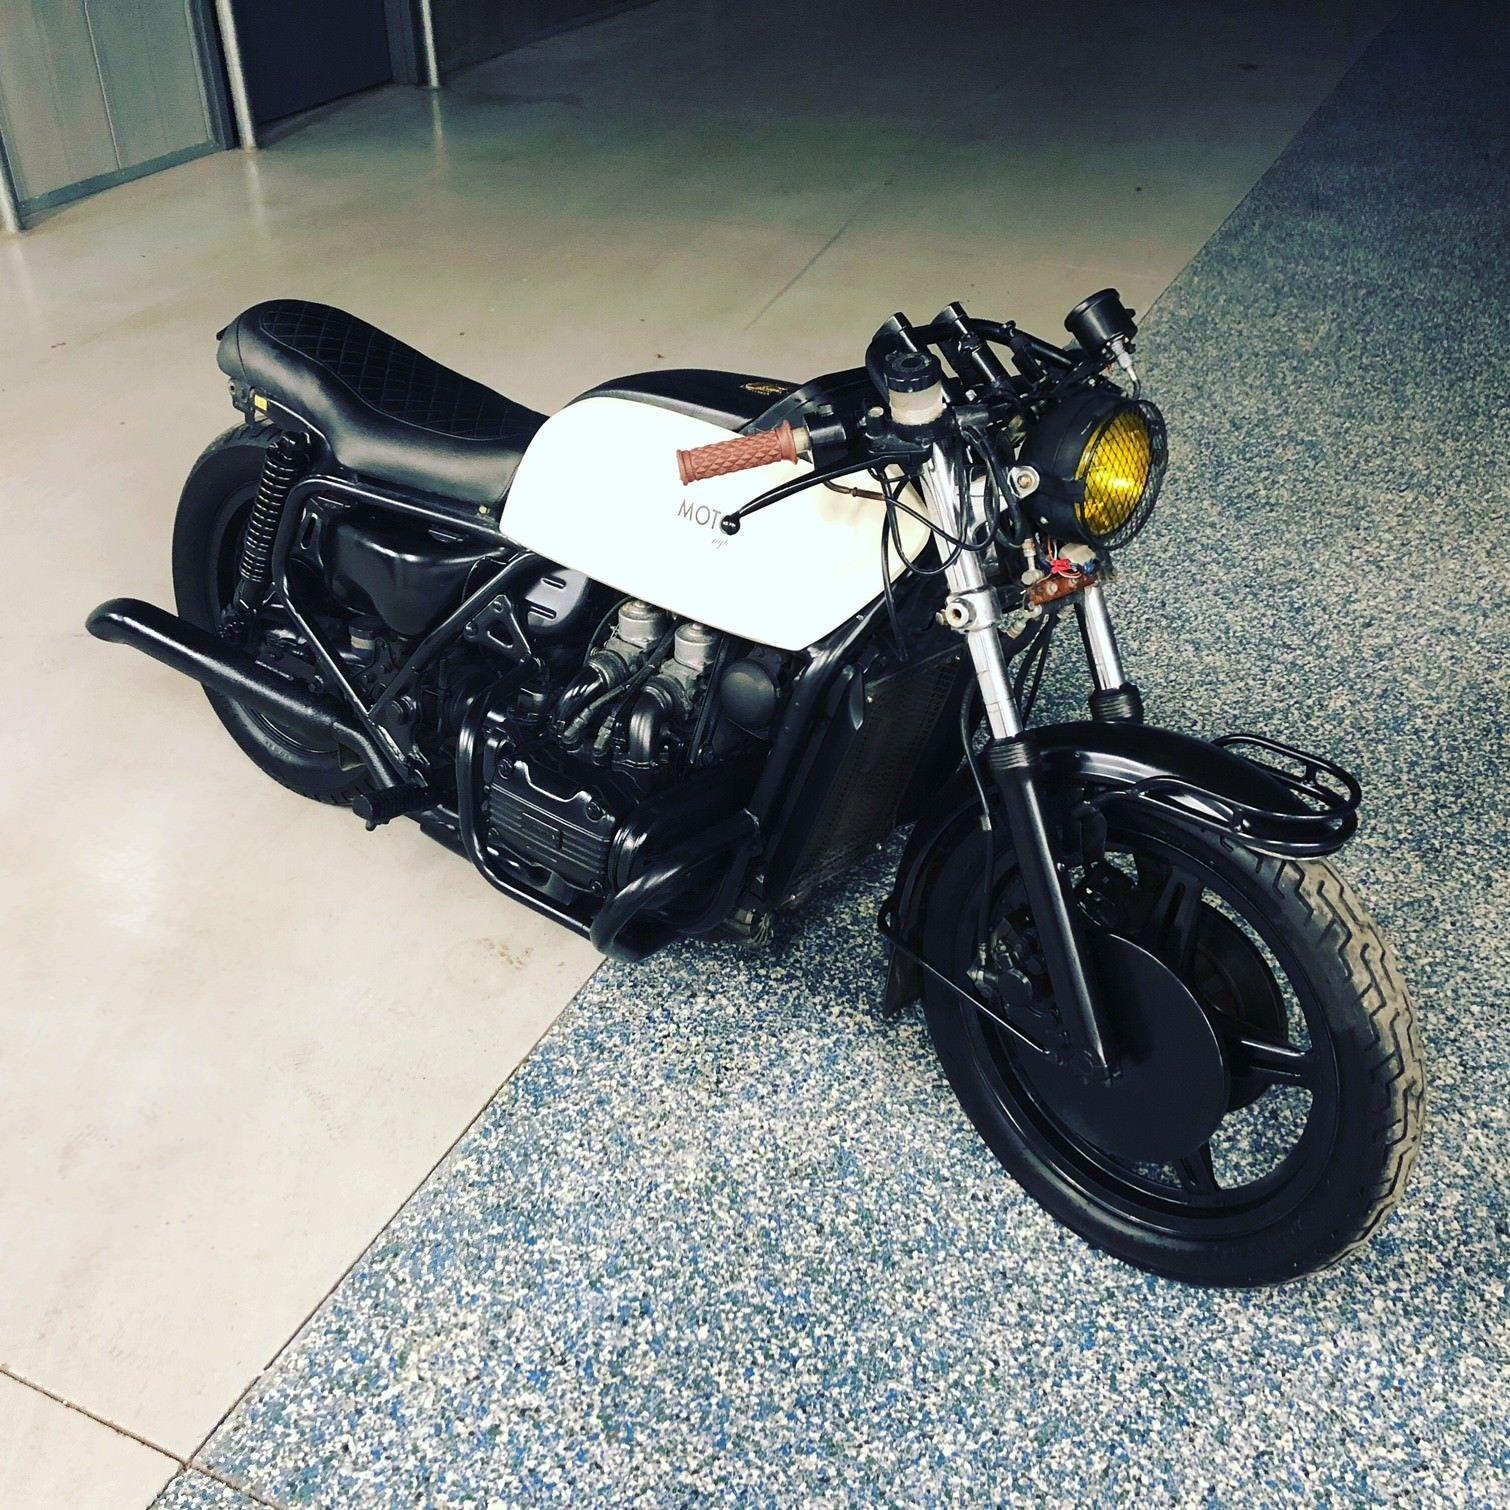 1979 Honda Cb Stuff For Sale Pinterest Custom Motorcycles 1970 Silver Wing Moto Pgh Gl1000 Cafe Racer Cb1000 750 900